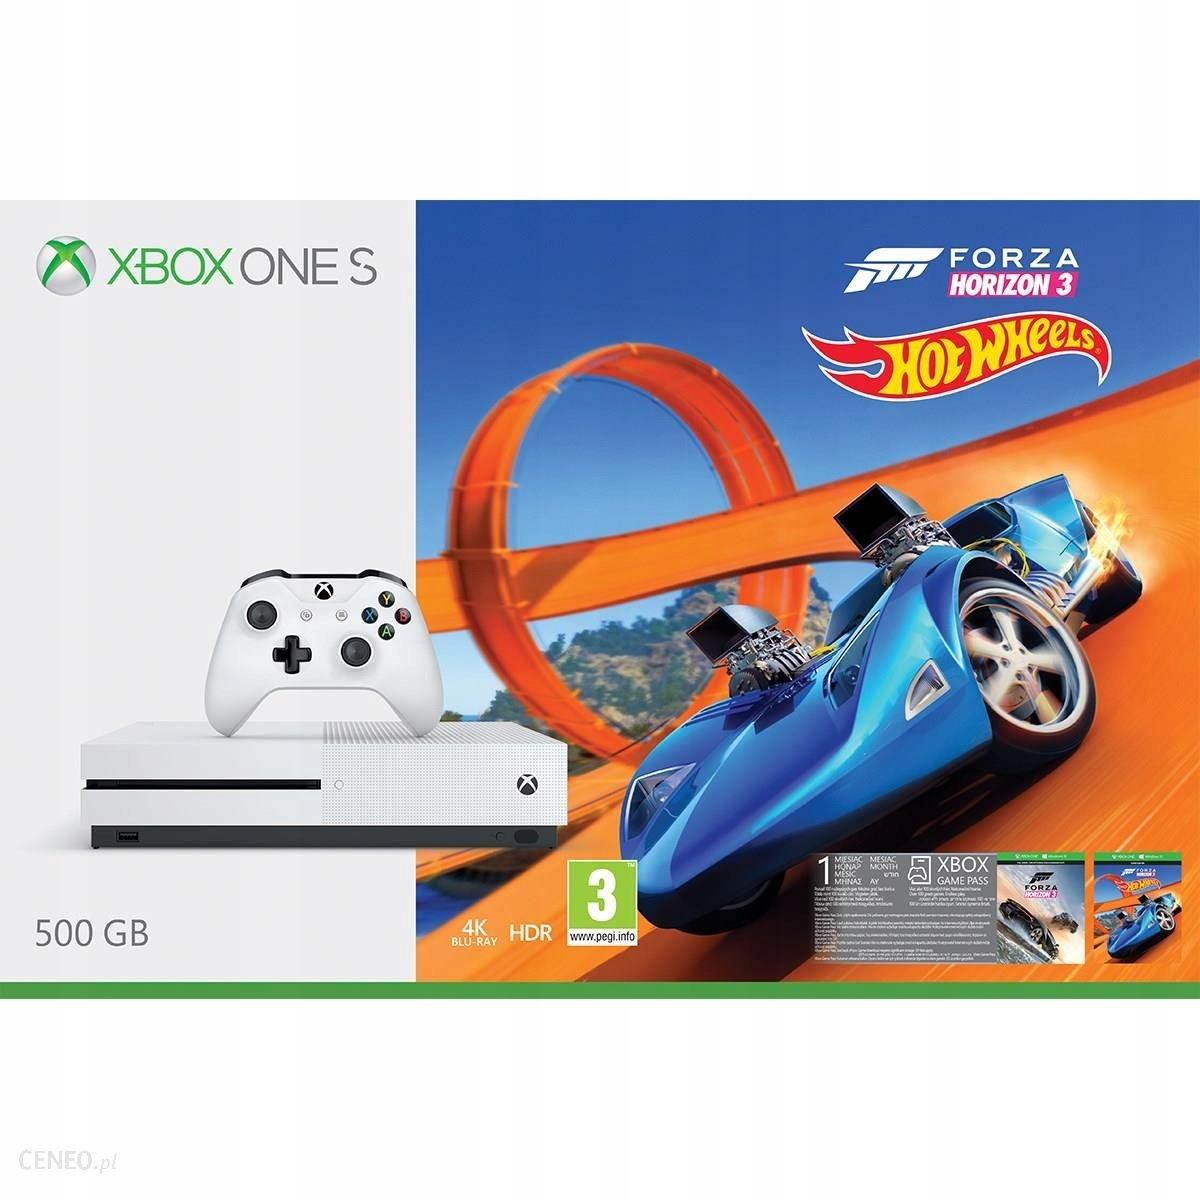 Xbox One Slim 500 GB +Forza Horizon 3+ Hot Weels